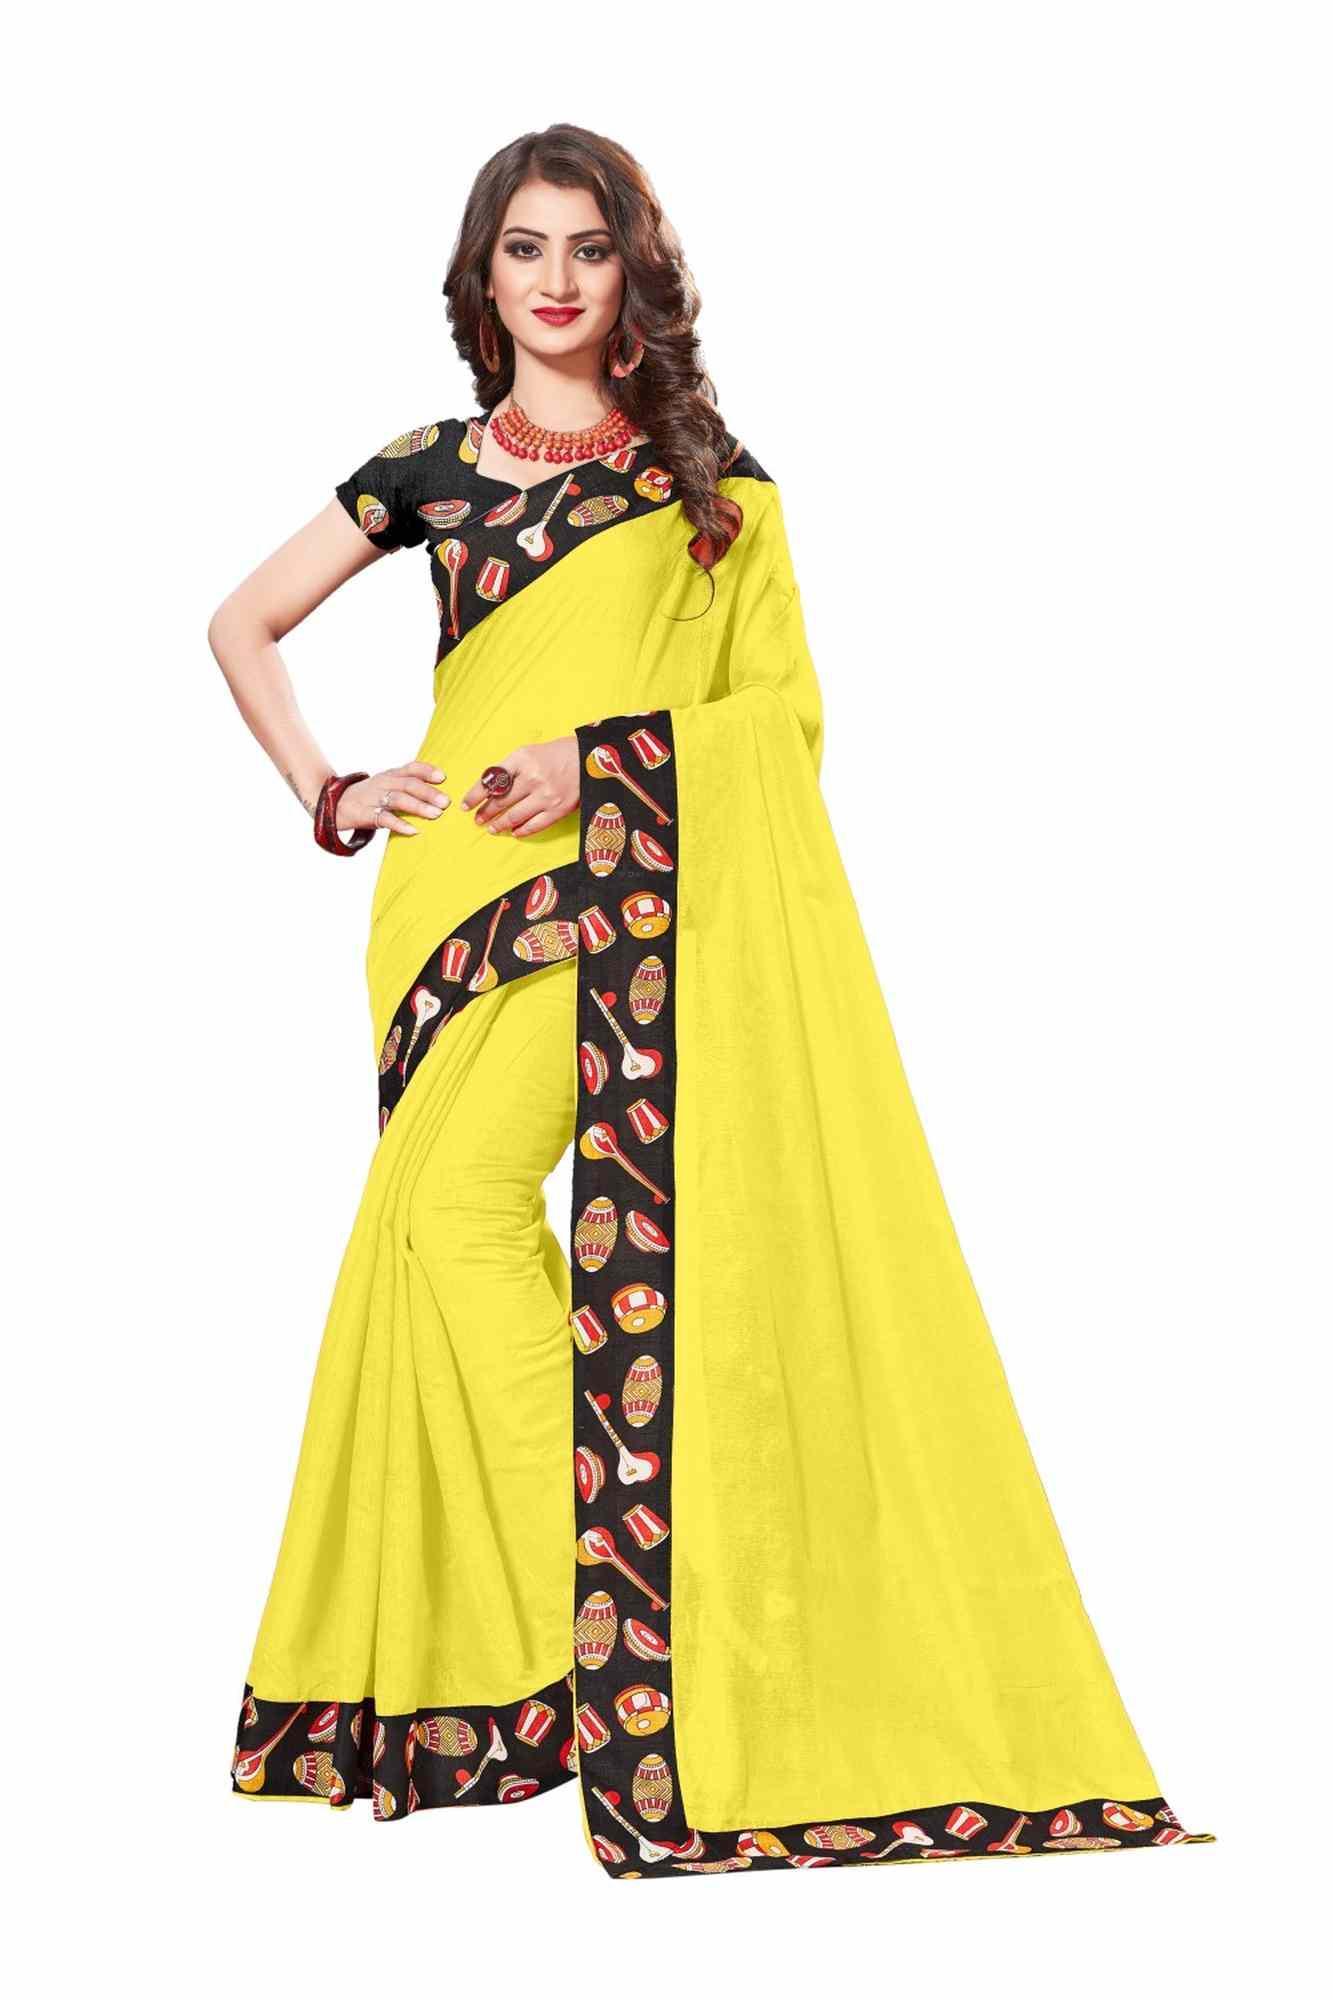 Women's Unique Chanderi Lace Border Regular Black Saree